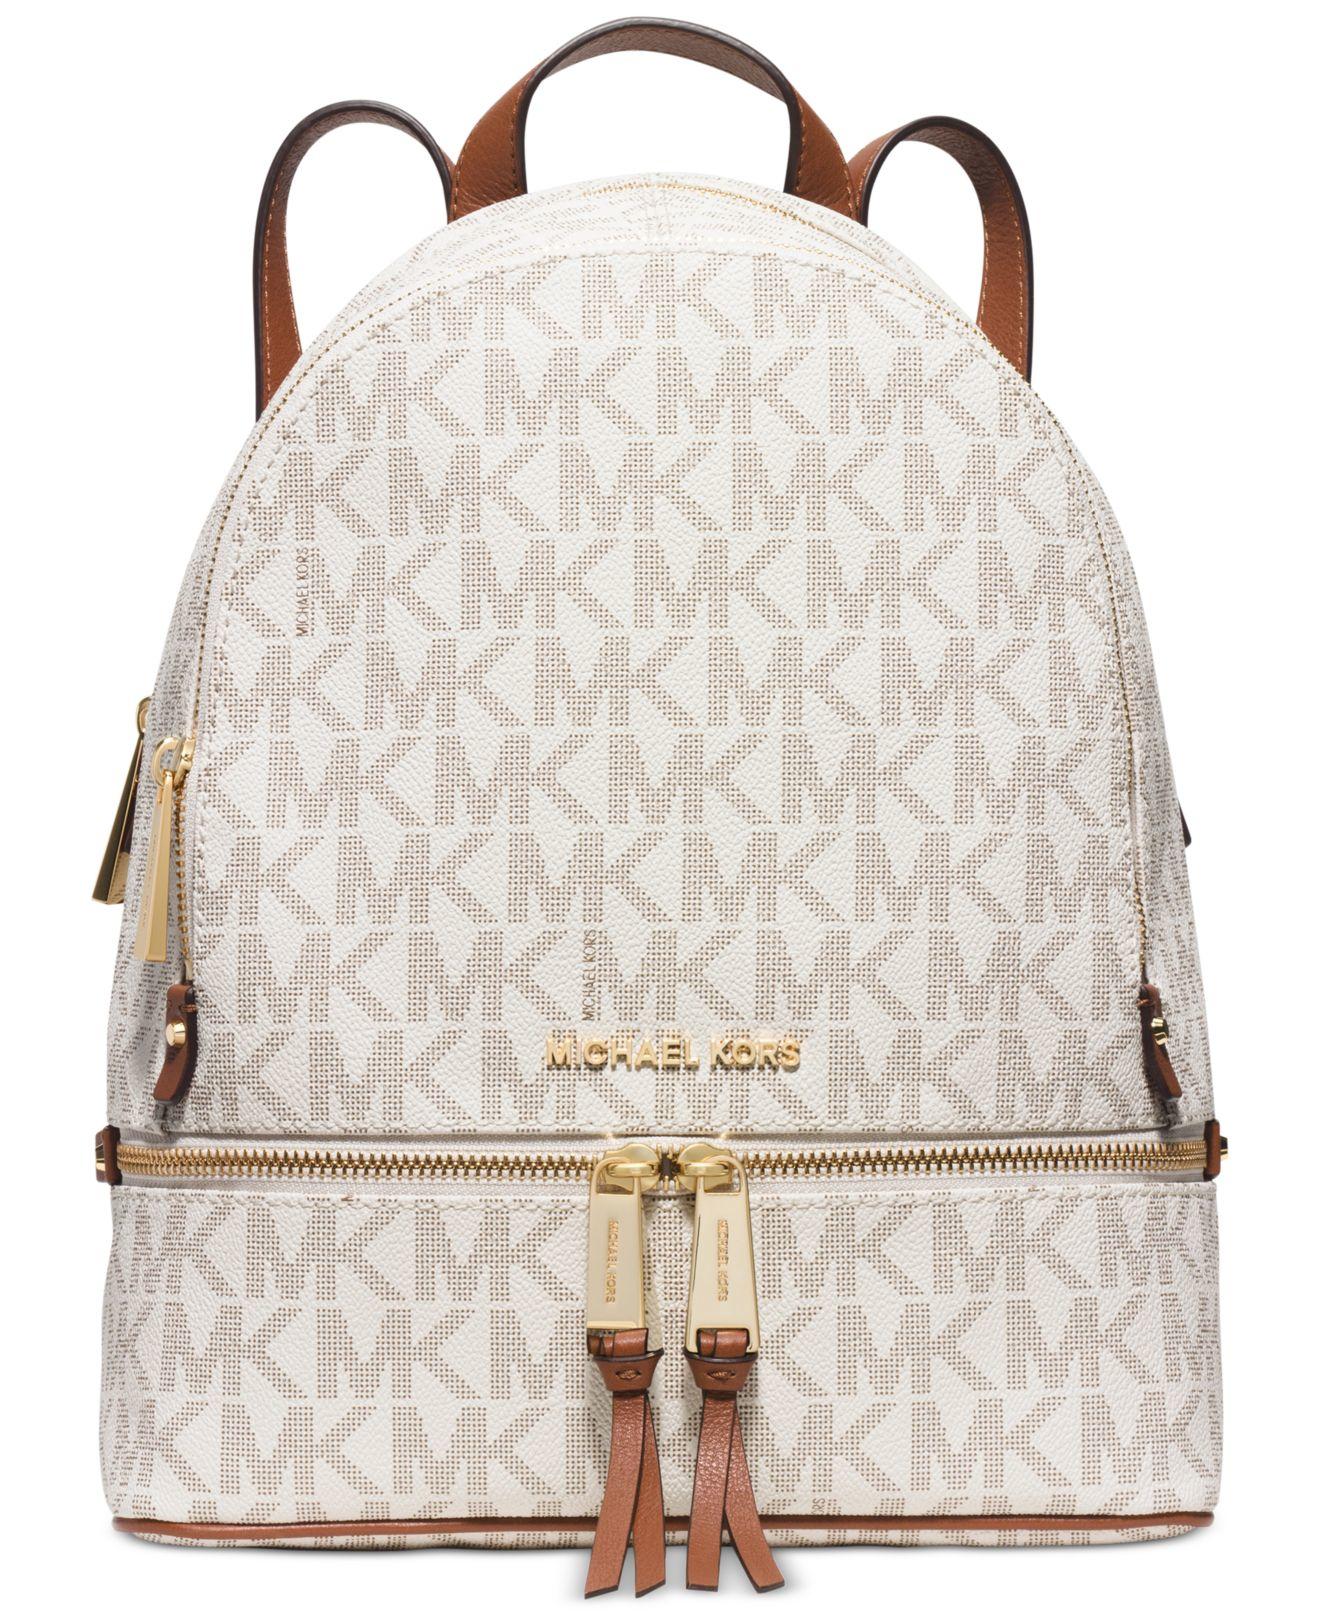 Lyst - Michael Kors Rhea Zip Medium Backpack - Save 44%